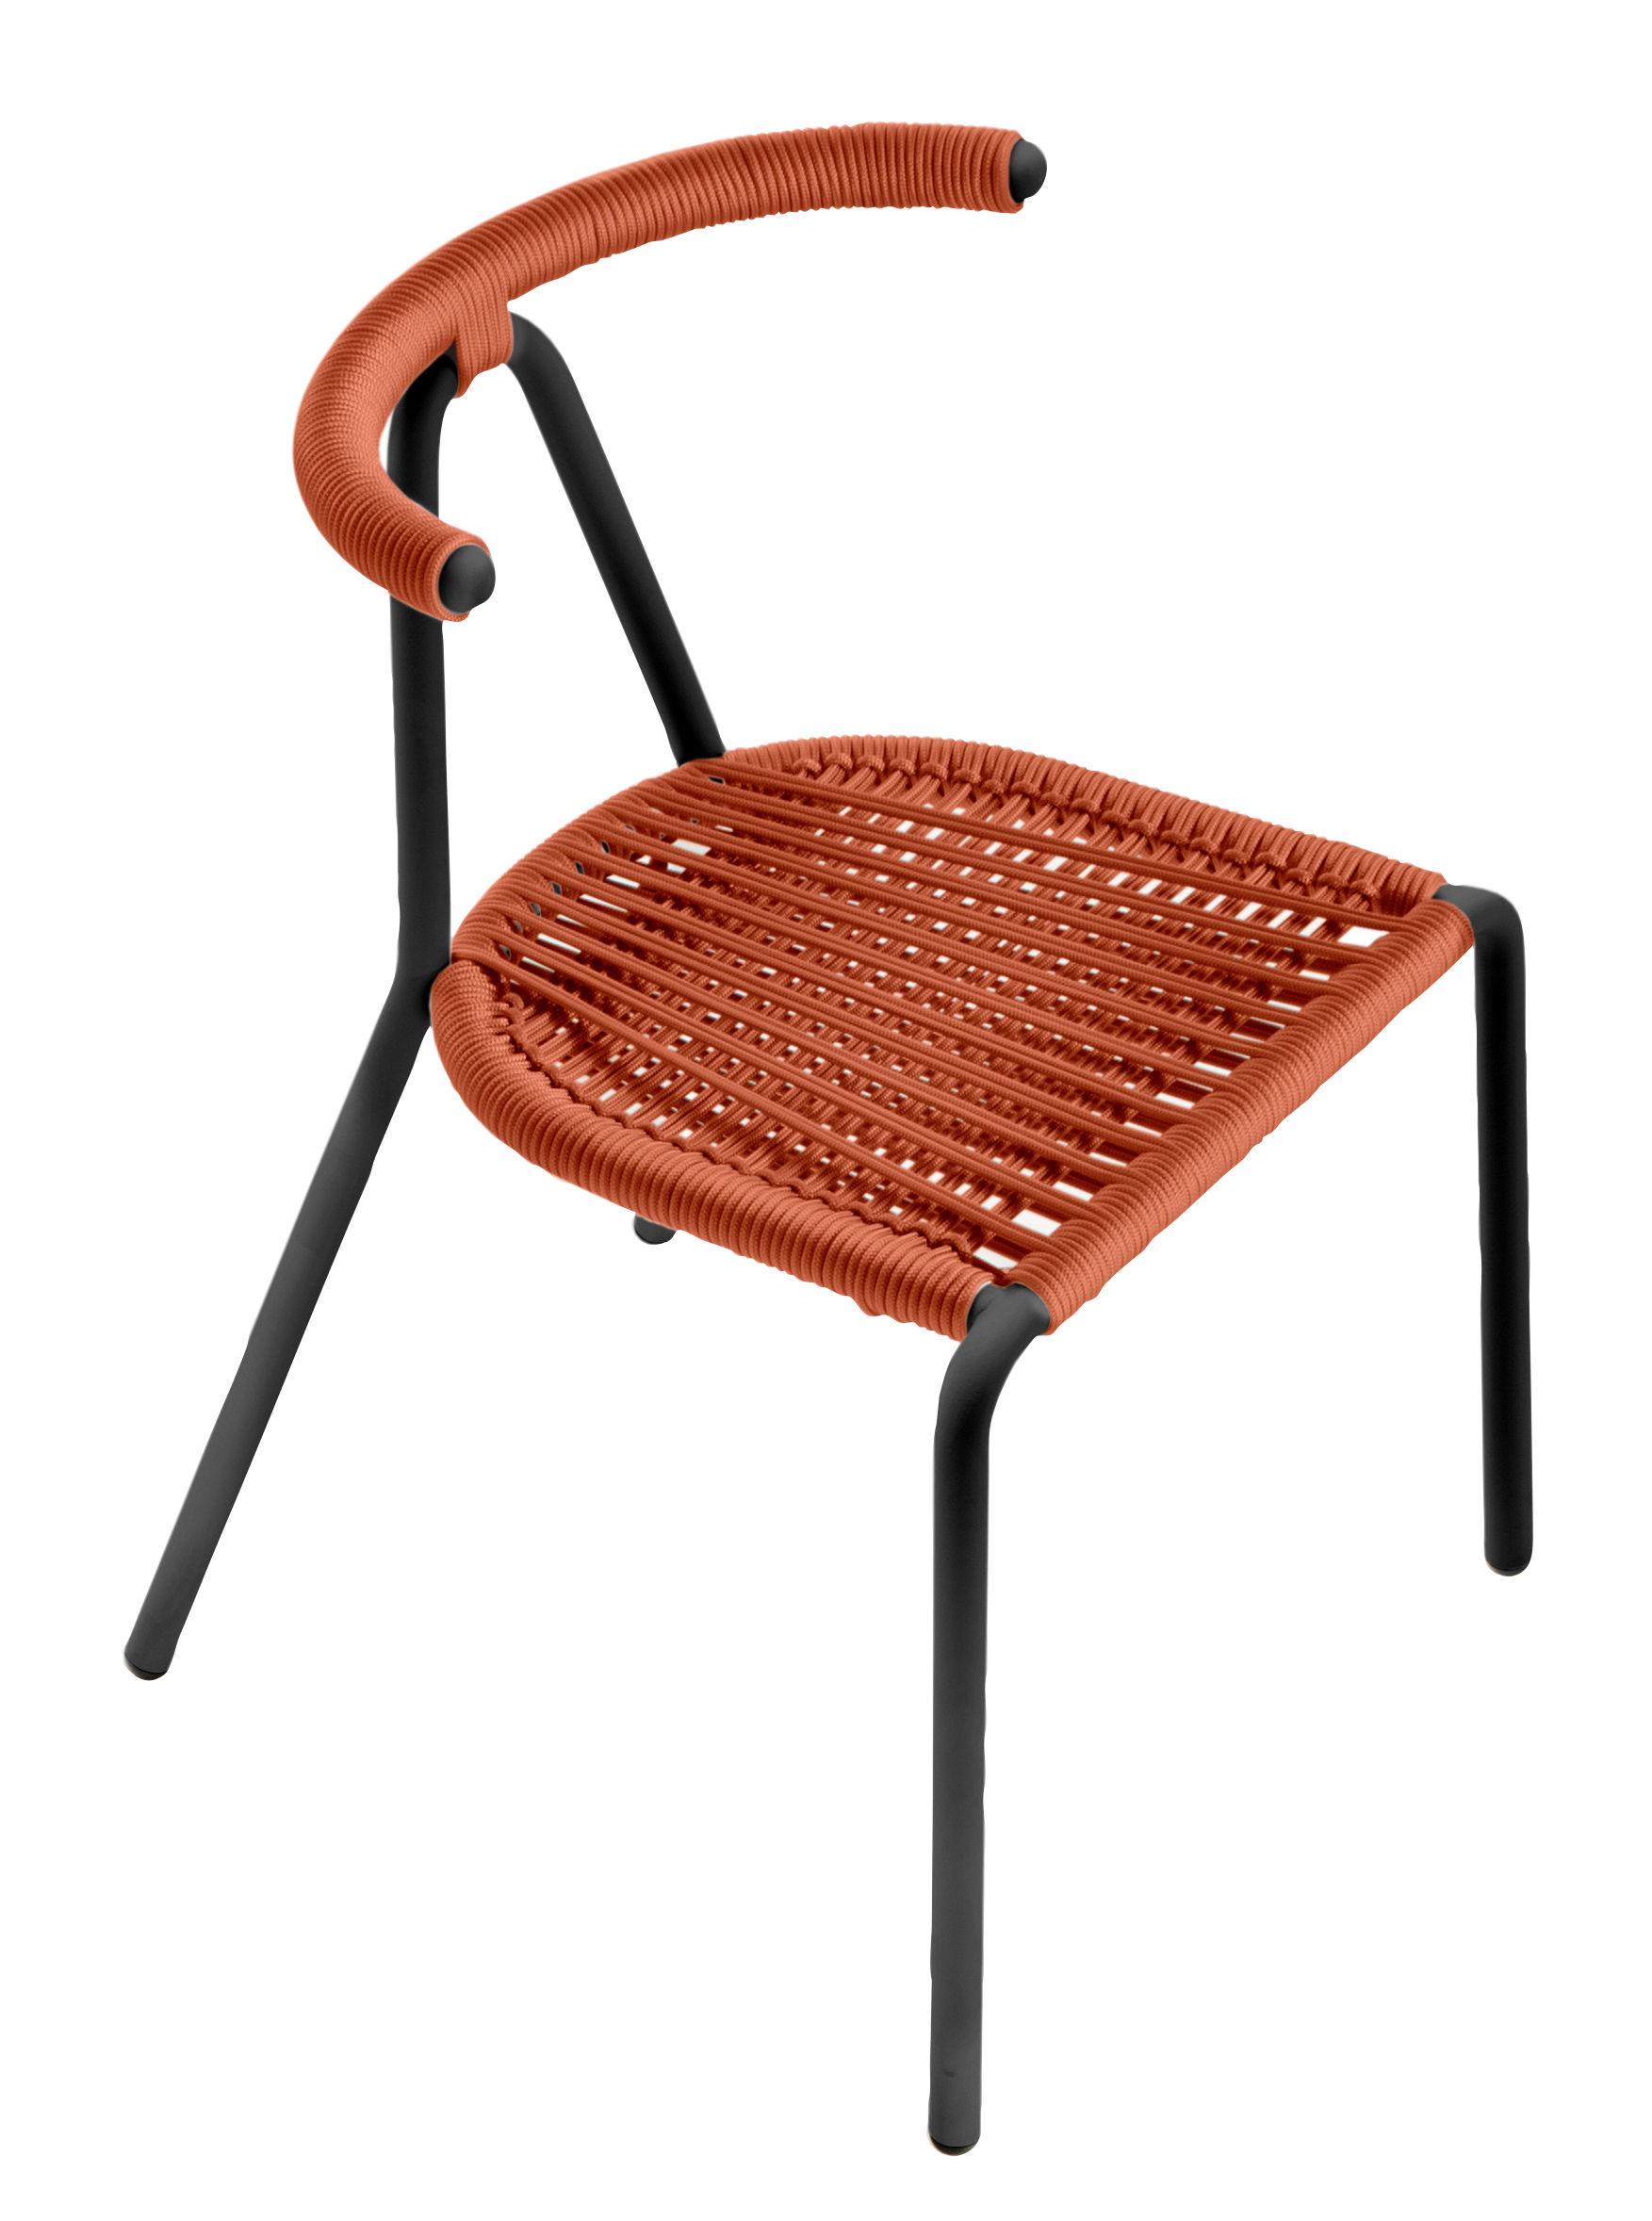 Sottopiatti Rattan Vendita Line.Toro Outdoor Sedia Impilabile Seduta Corda Intrecciata Arancione